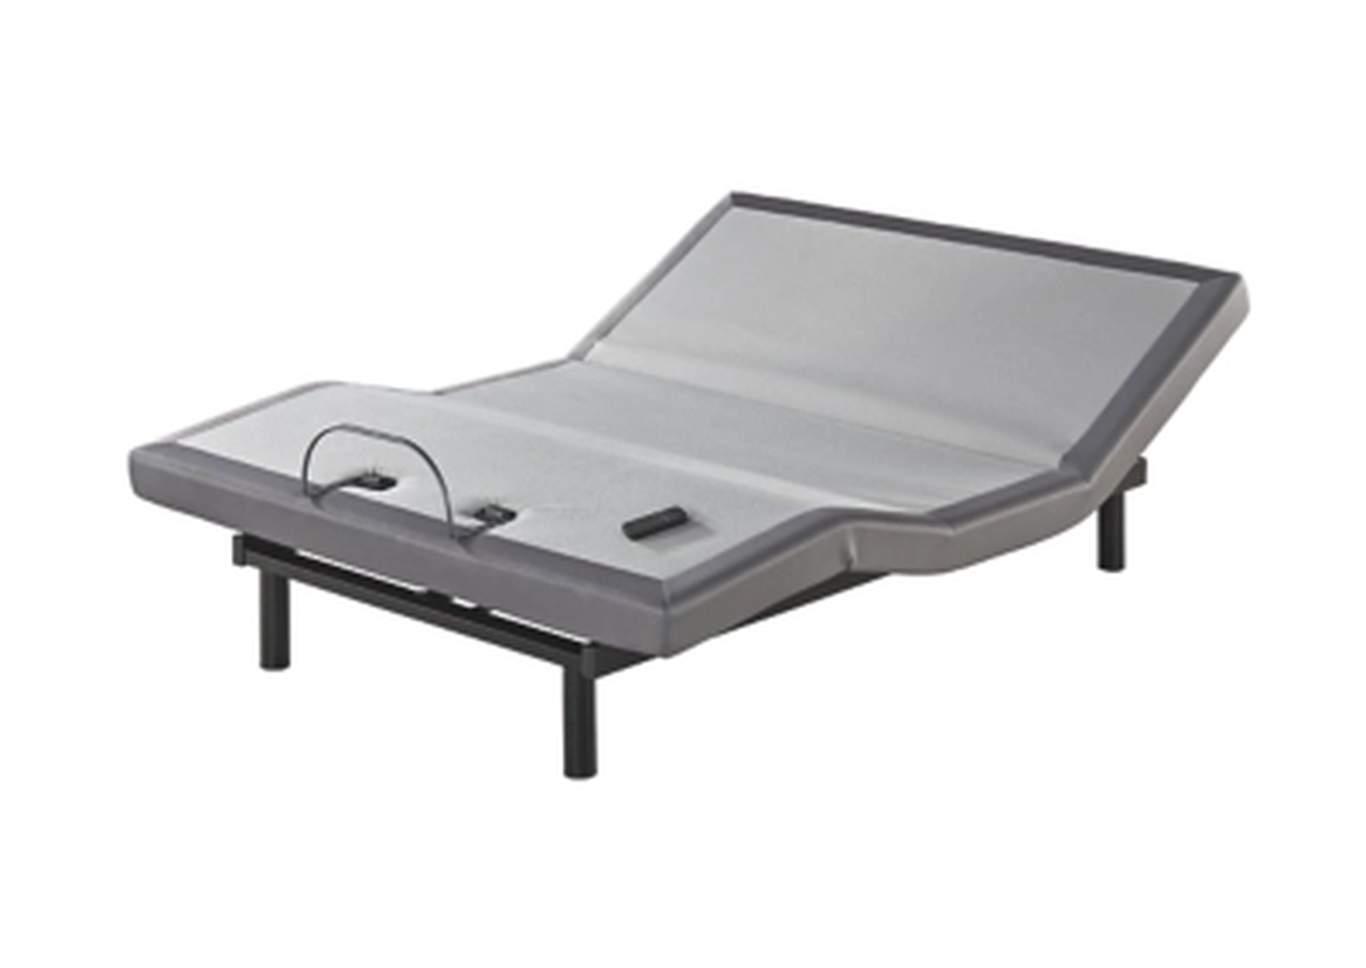 TNT Furniture & Mattress King Adjustable Base